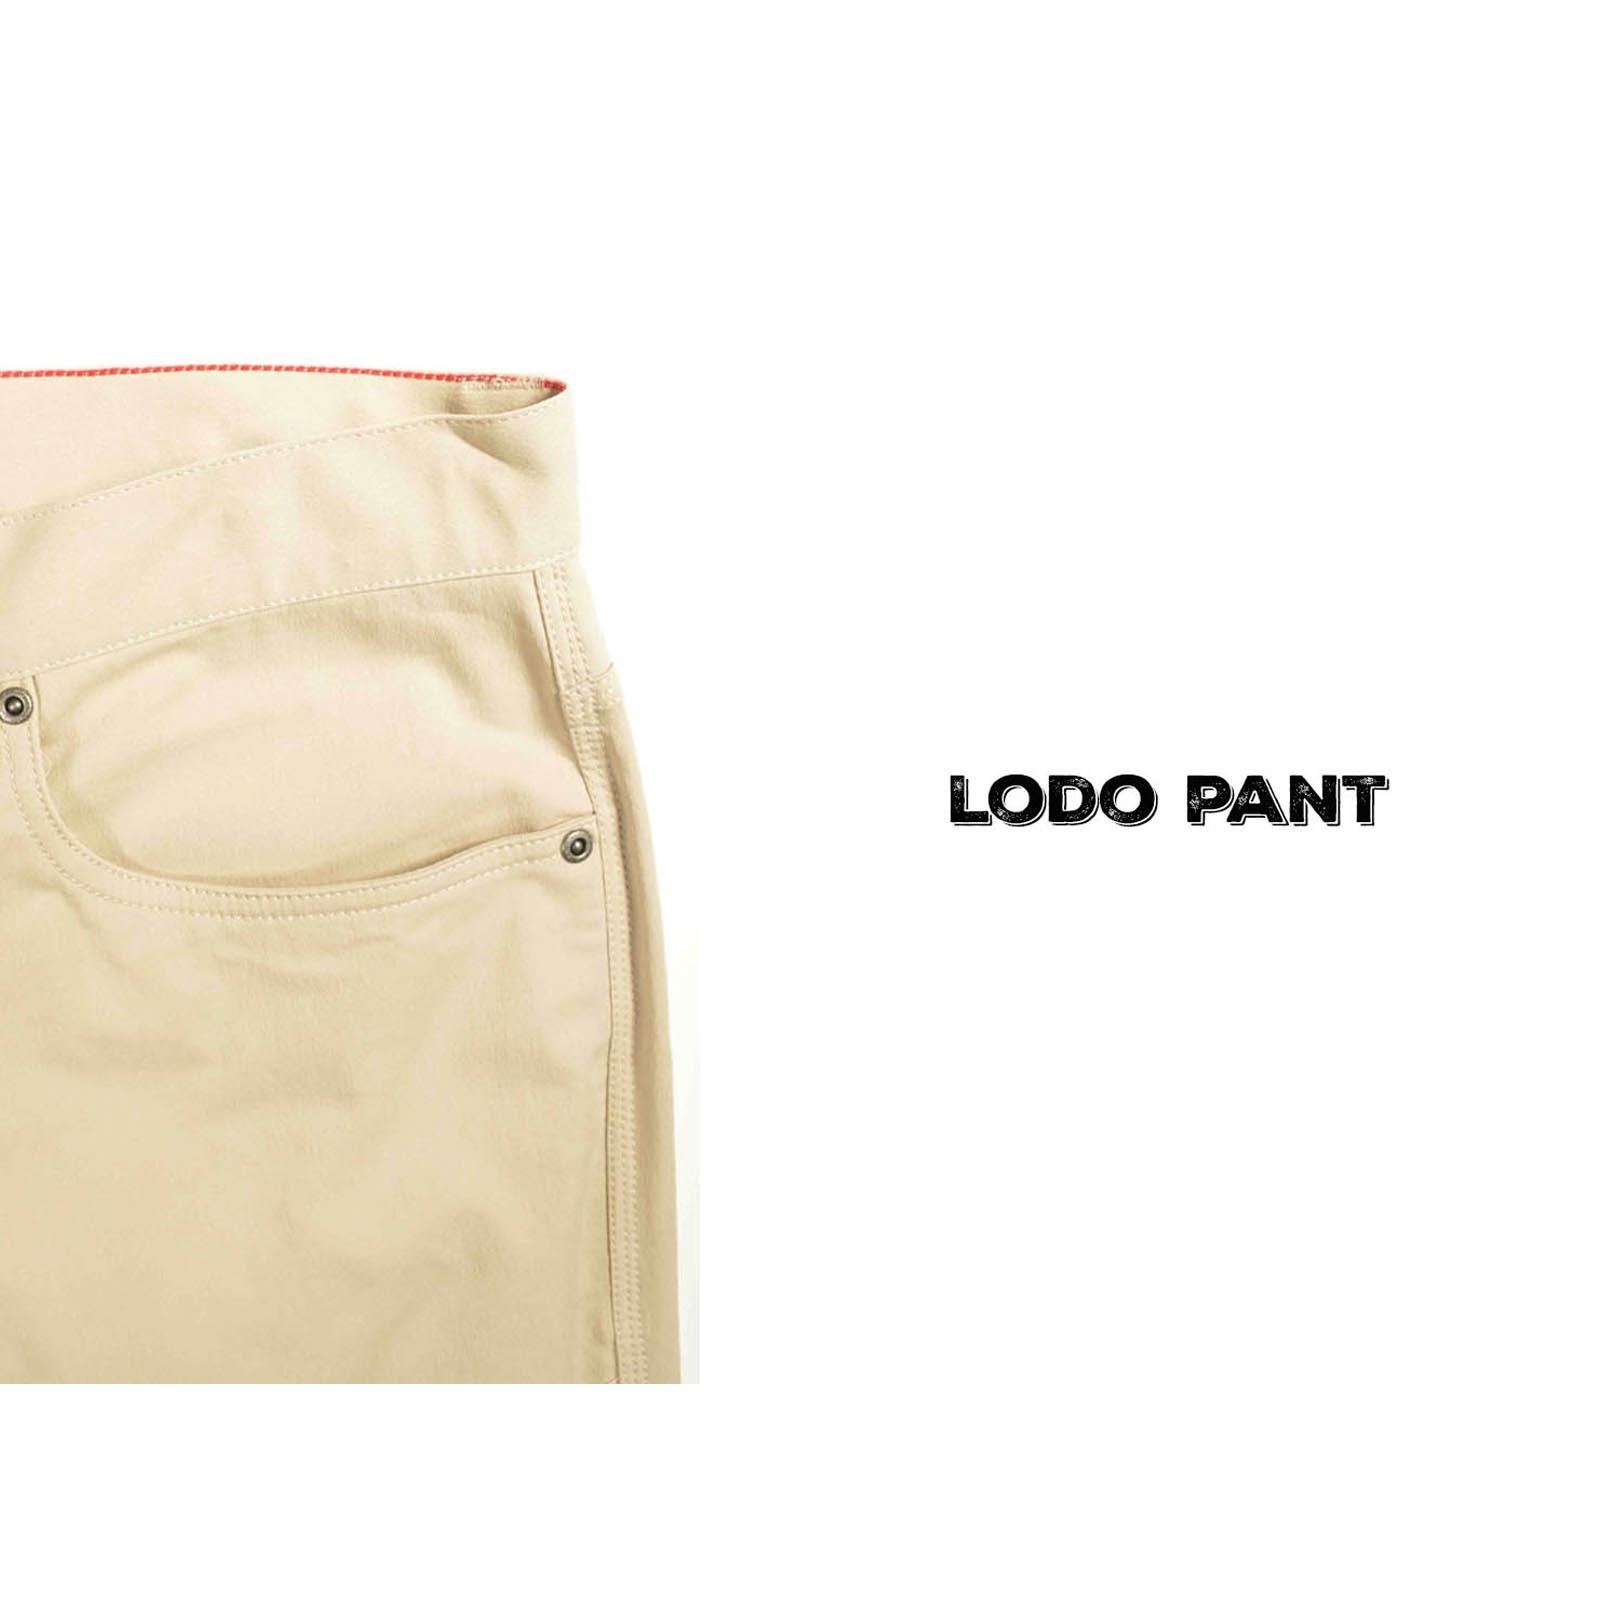 Lodo Pant Detail